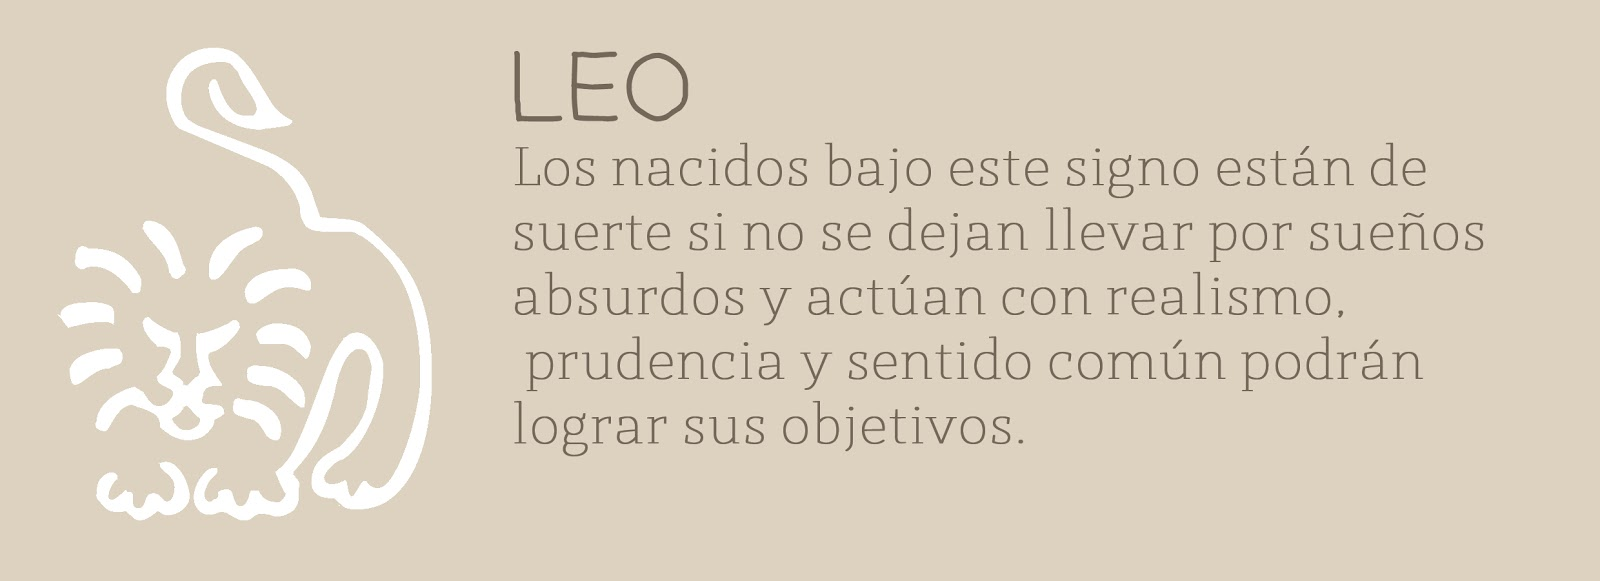 horoscopos hoy leo: